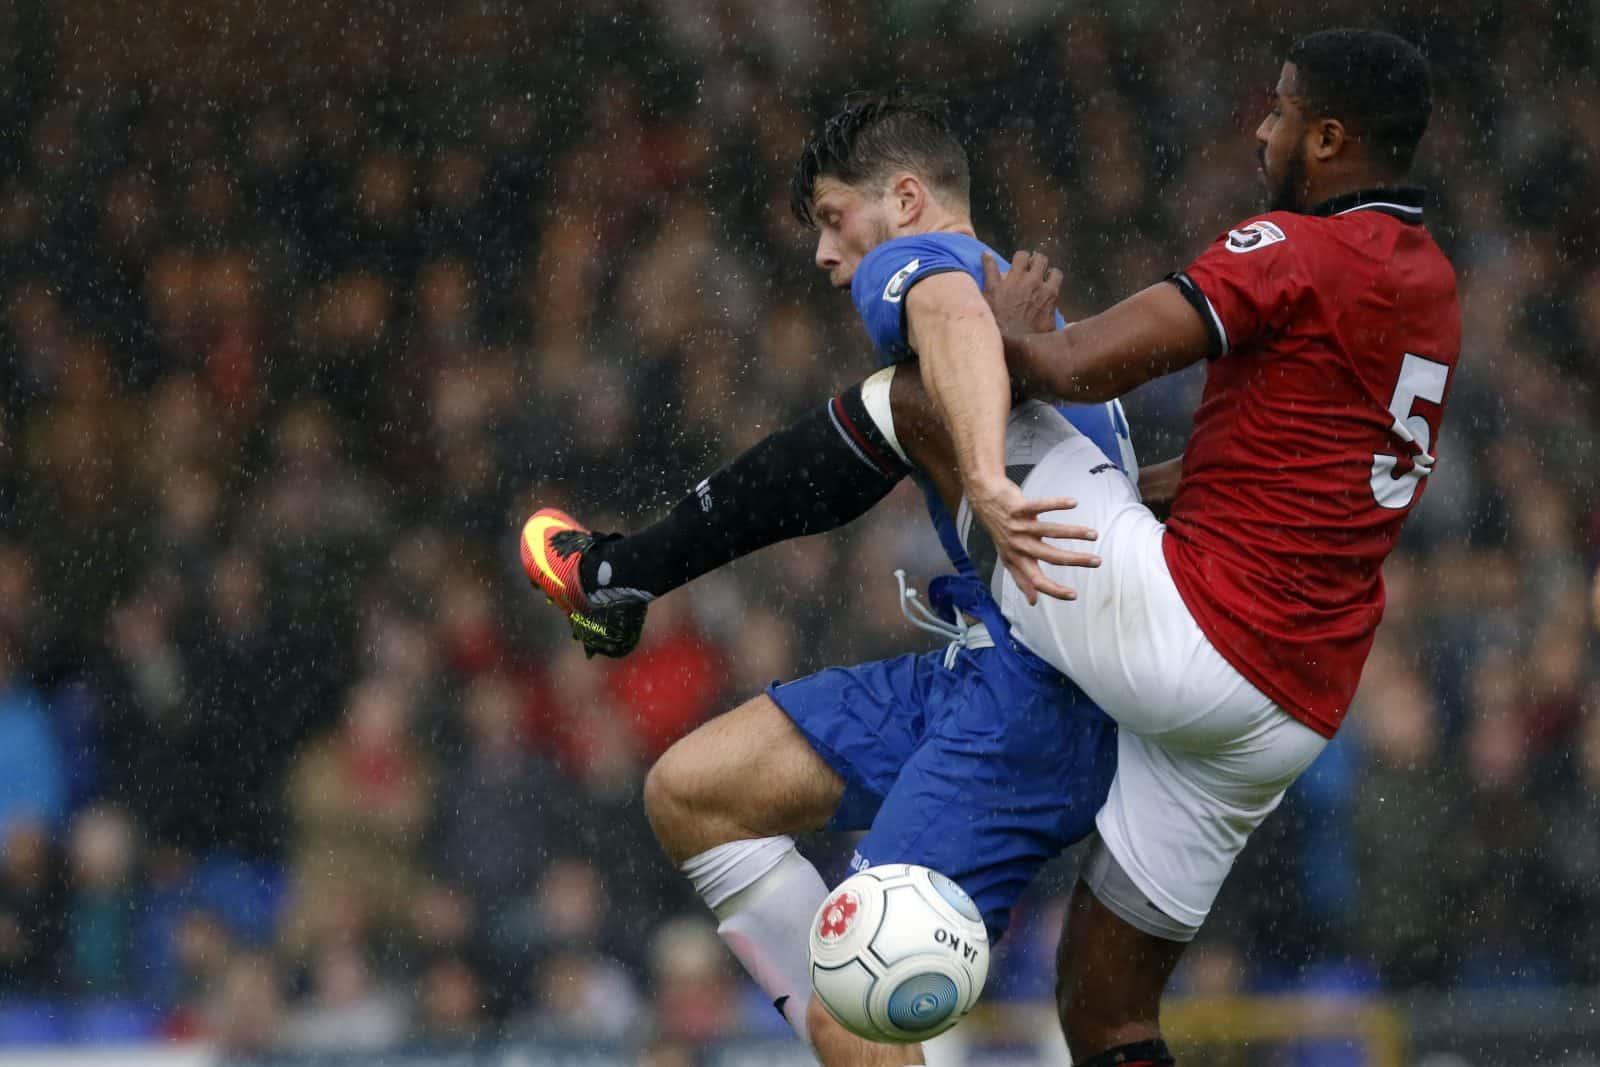 Jason Oswell, Stockport County 3-3 FC United 30.9.17